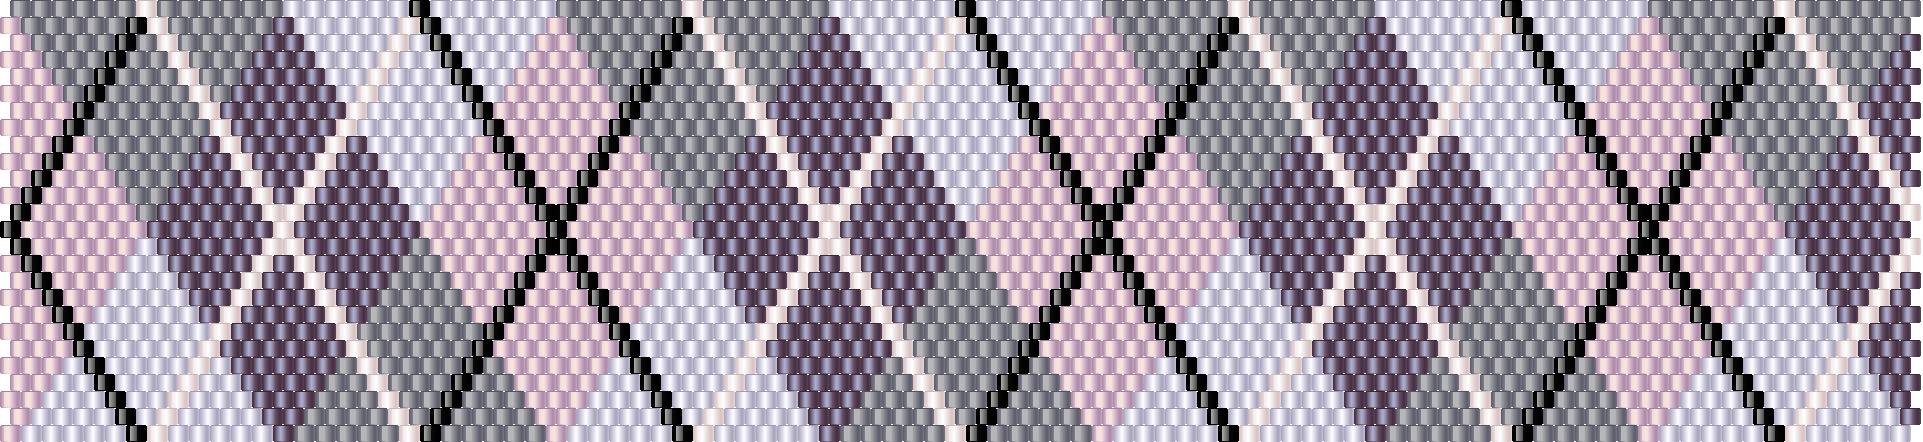 pattern jacquard